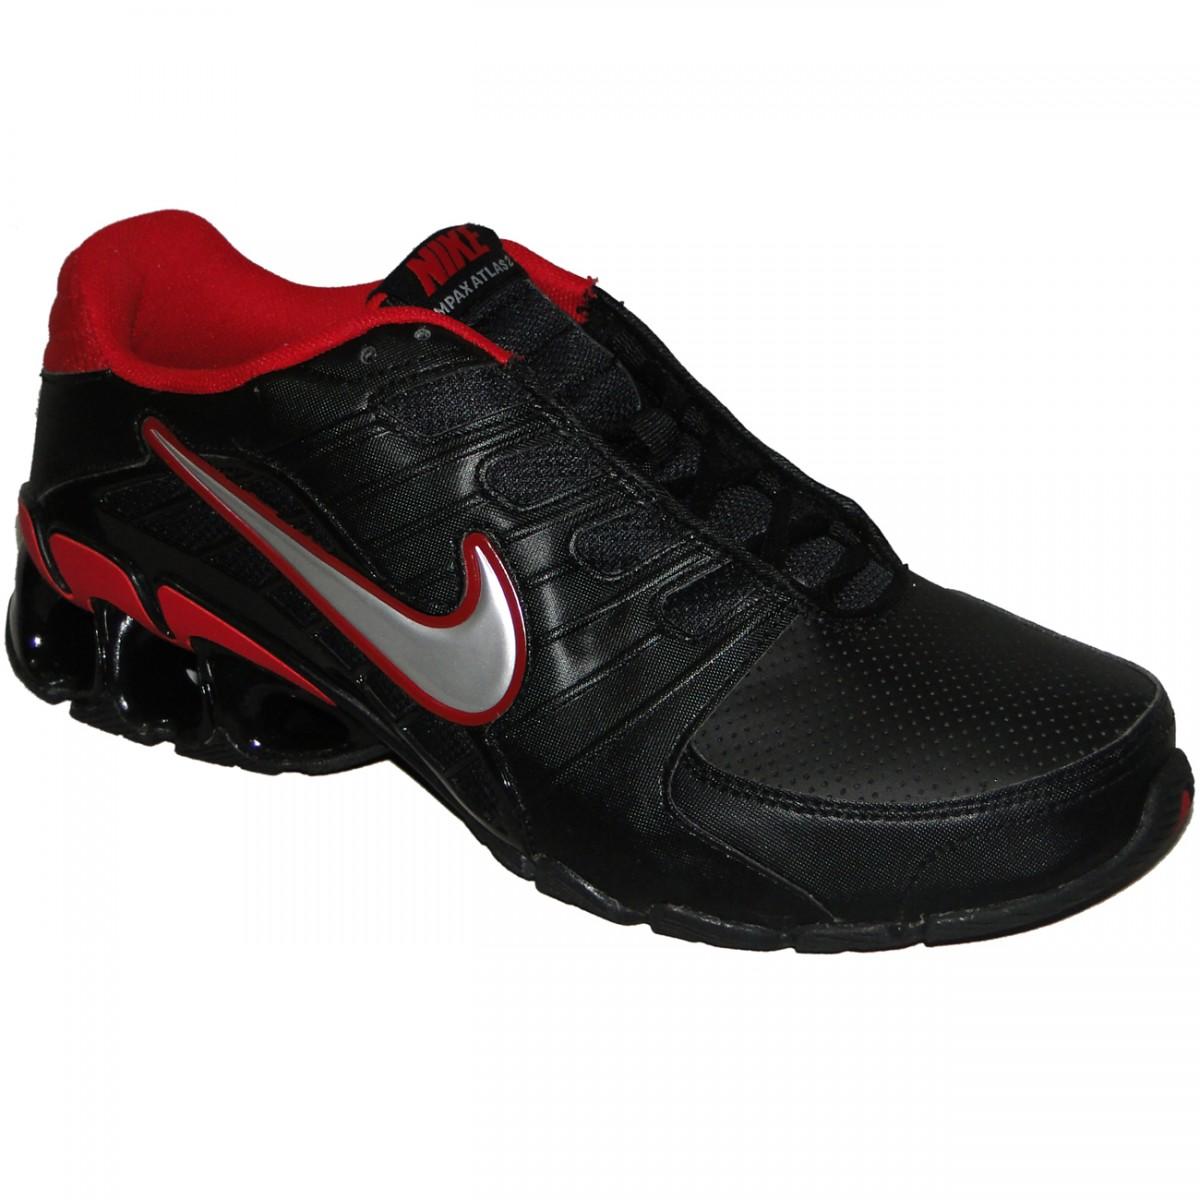 d2677ec0609 Tênis Nike Impax Atlas 2 Sl 8448 - PRETO PRATA VERMELHO - Chuteira Nike